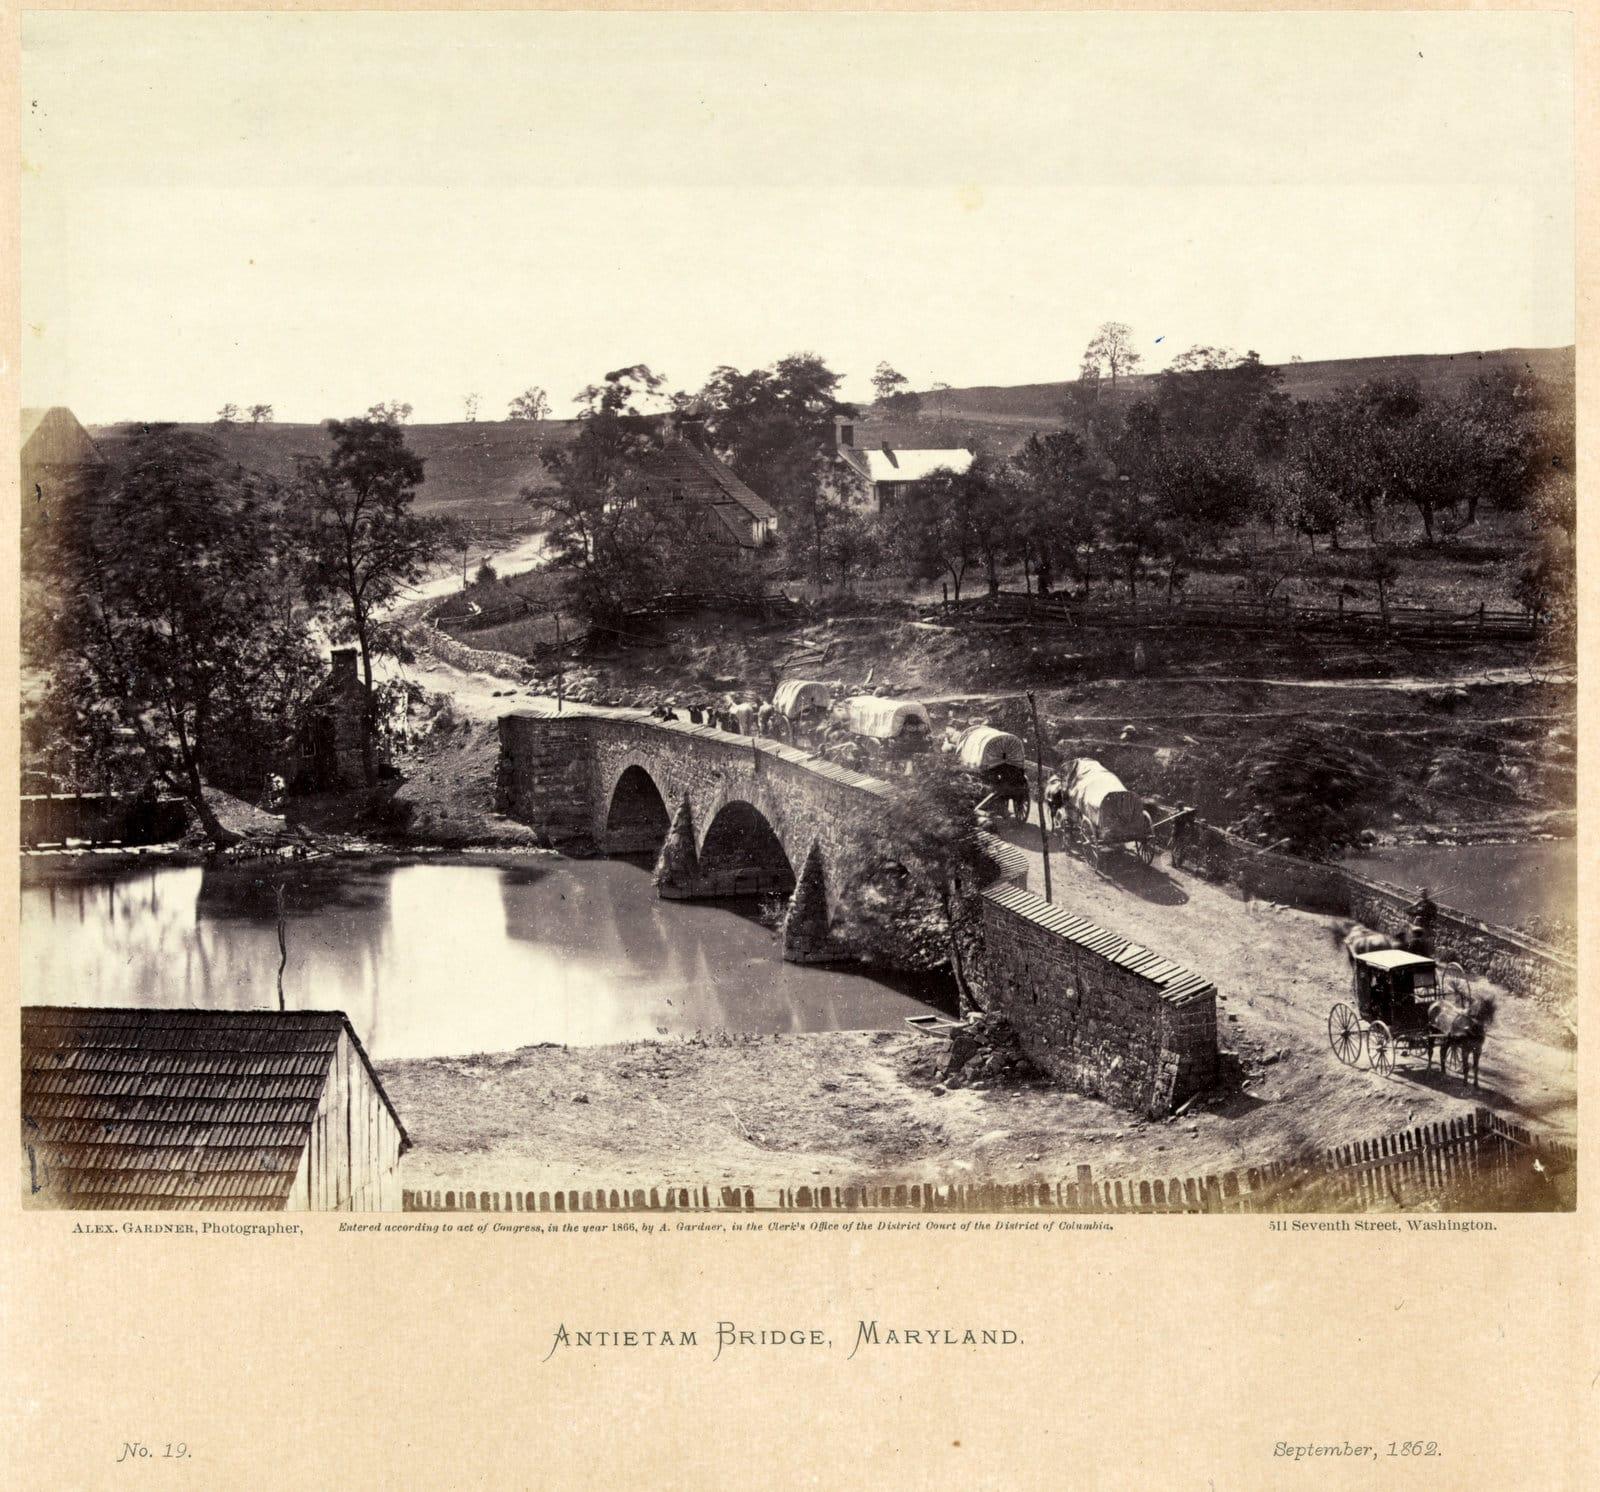 Antietam Bridge, Maryland (1862)